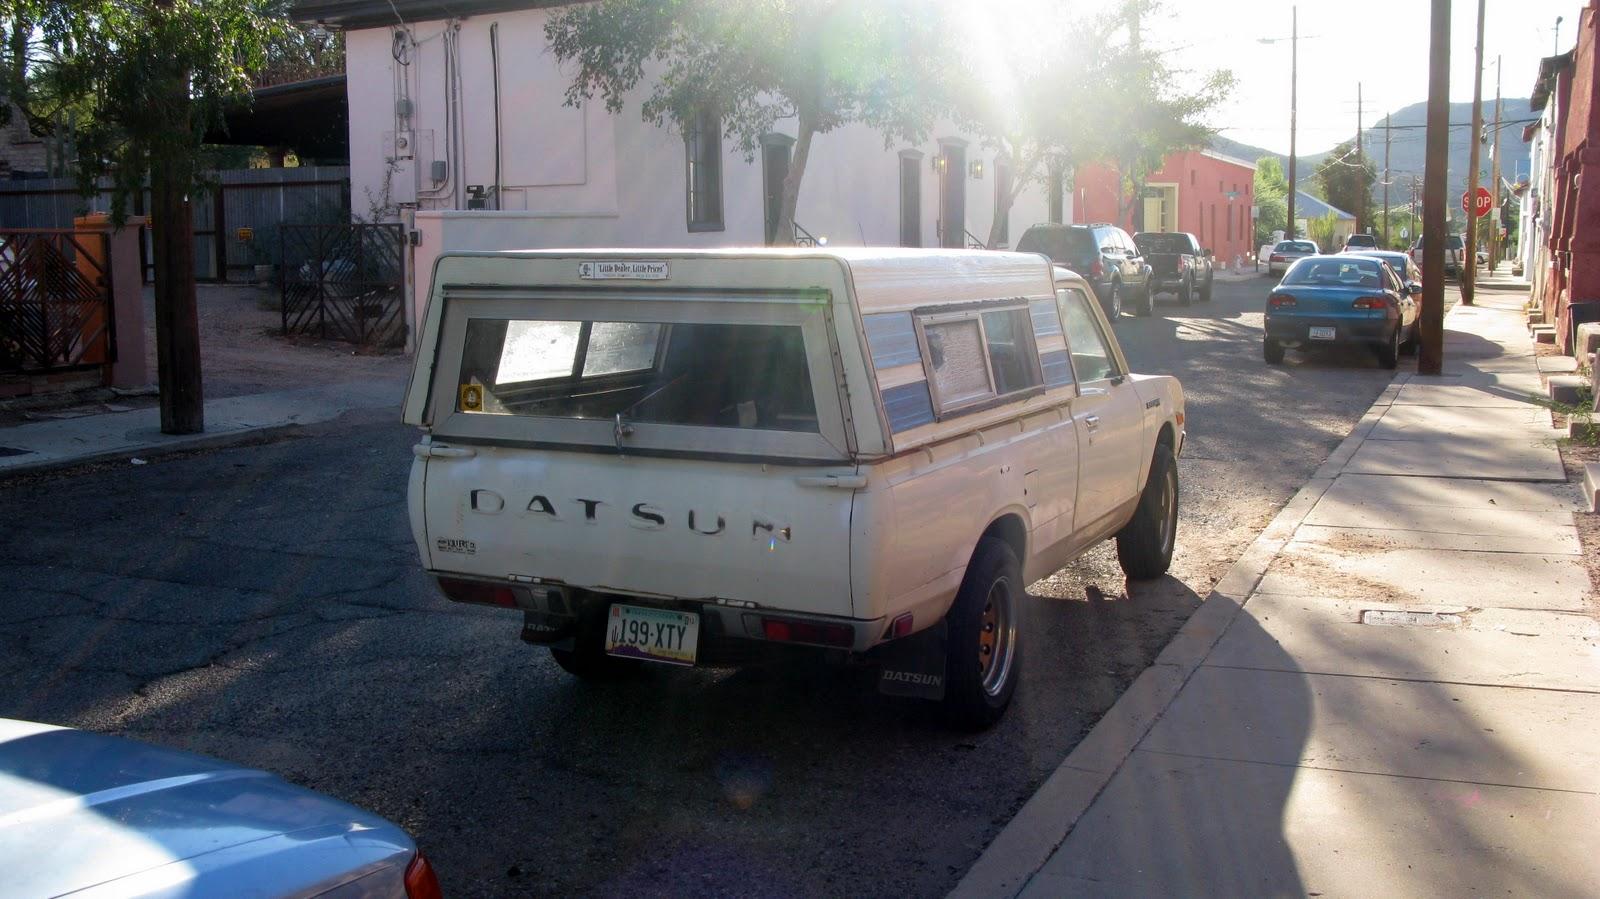 TOYOTA HILUX 1987 - 21 04 2010